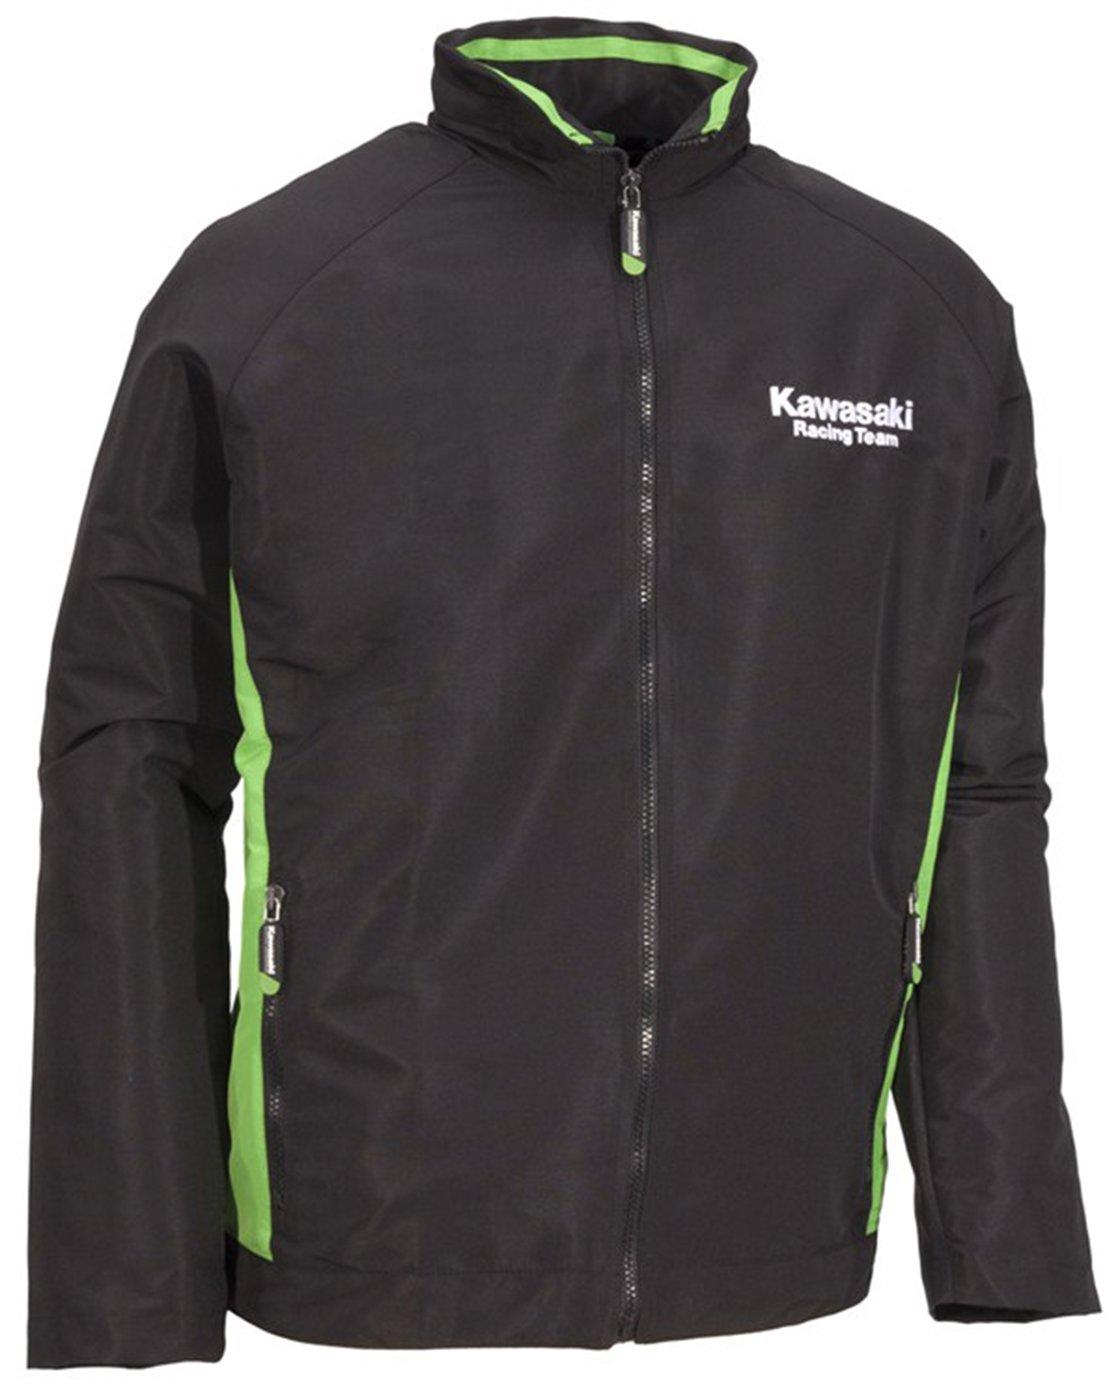 Куртка Kawasaki KRT Jacket Black